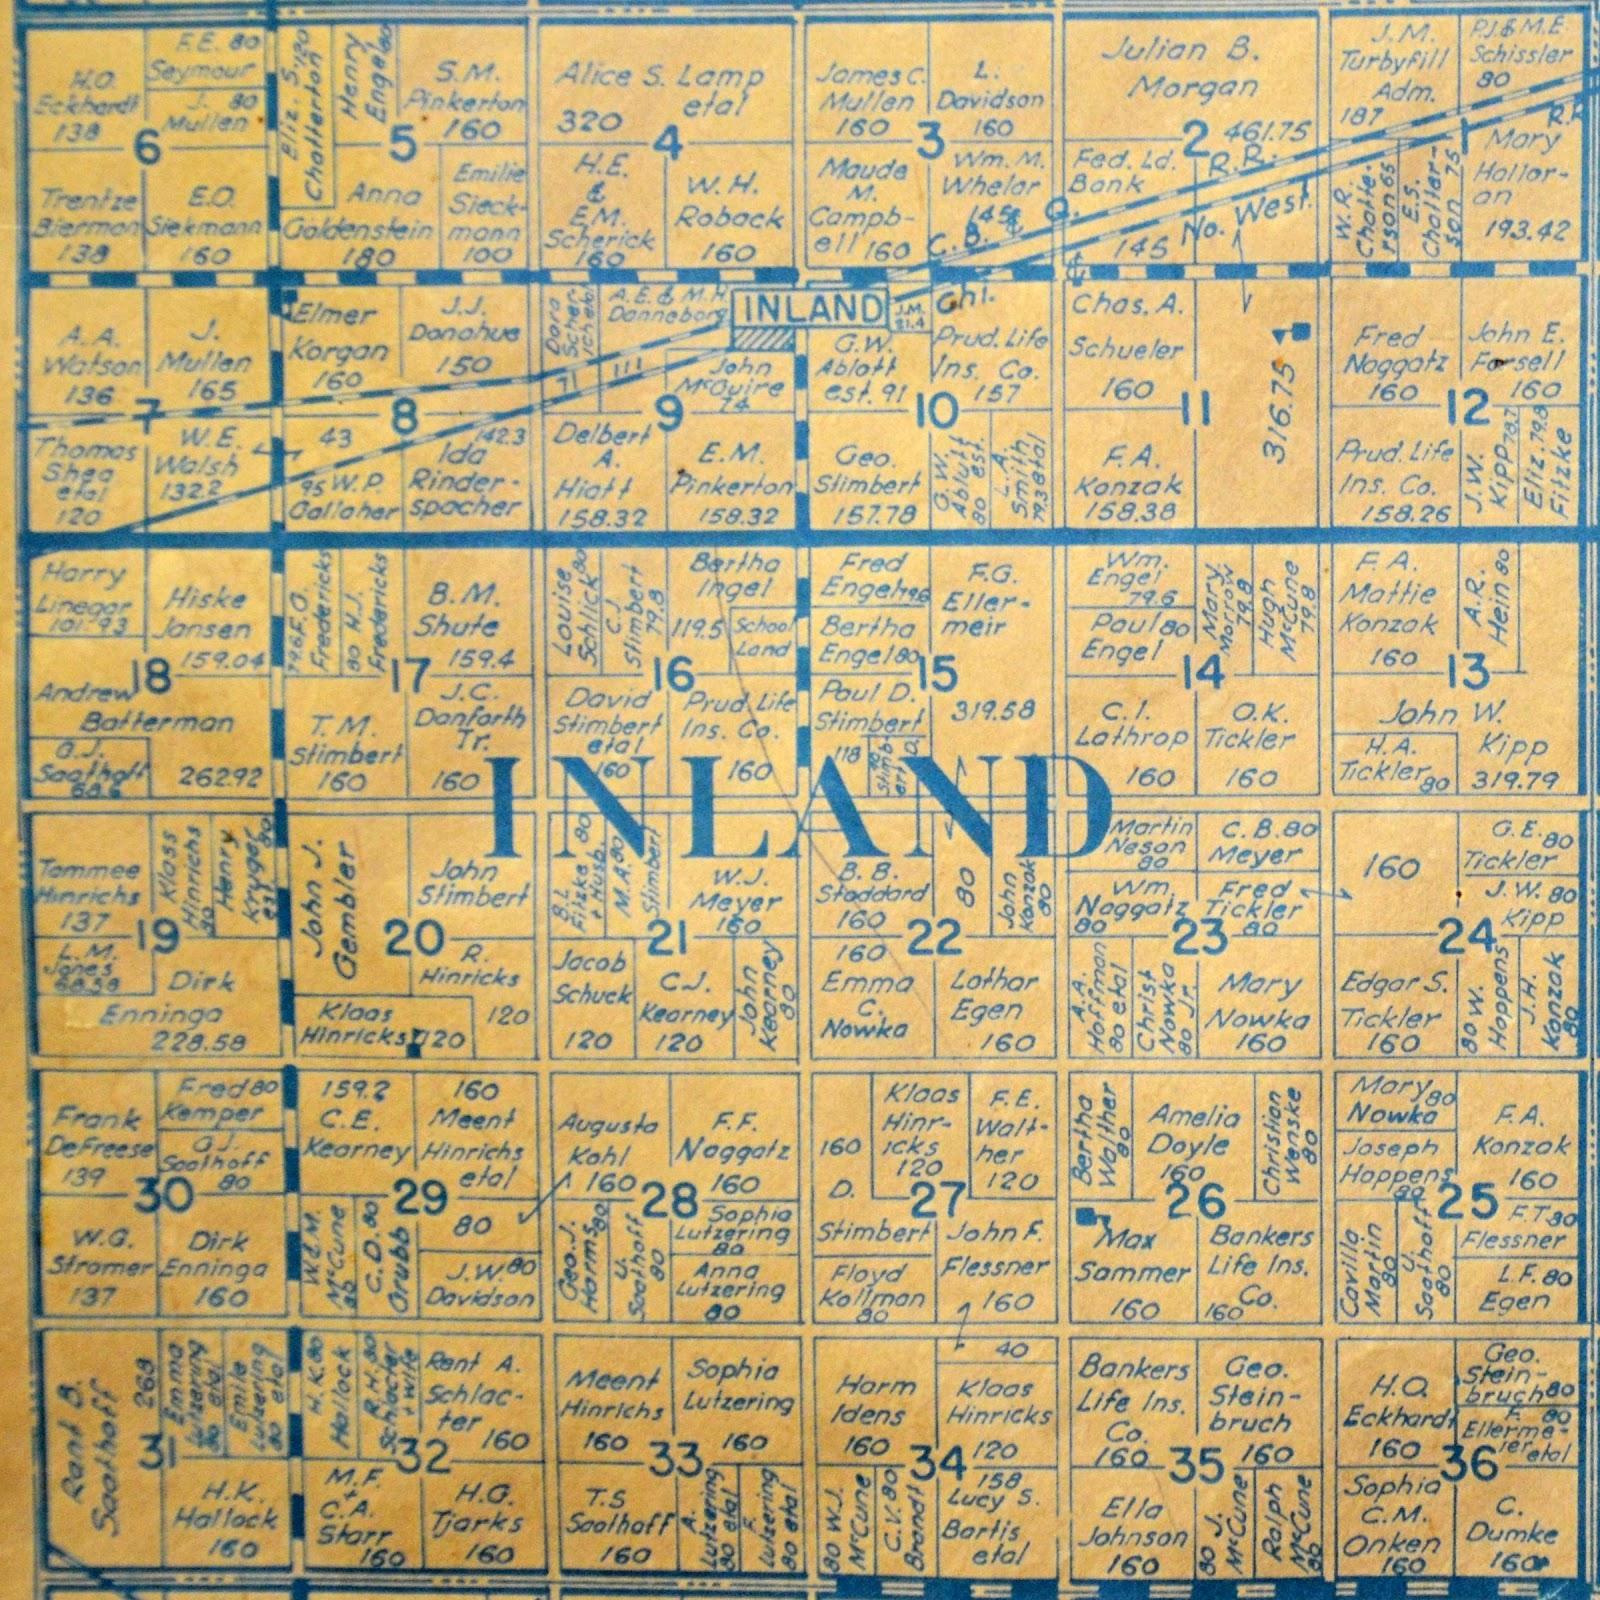 Sutton Nebraska Museum: 1937 Plat Map of Inland Township, Clay Countyinland township